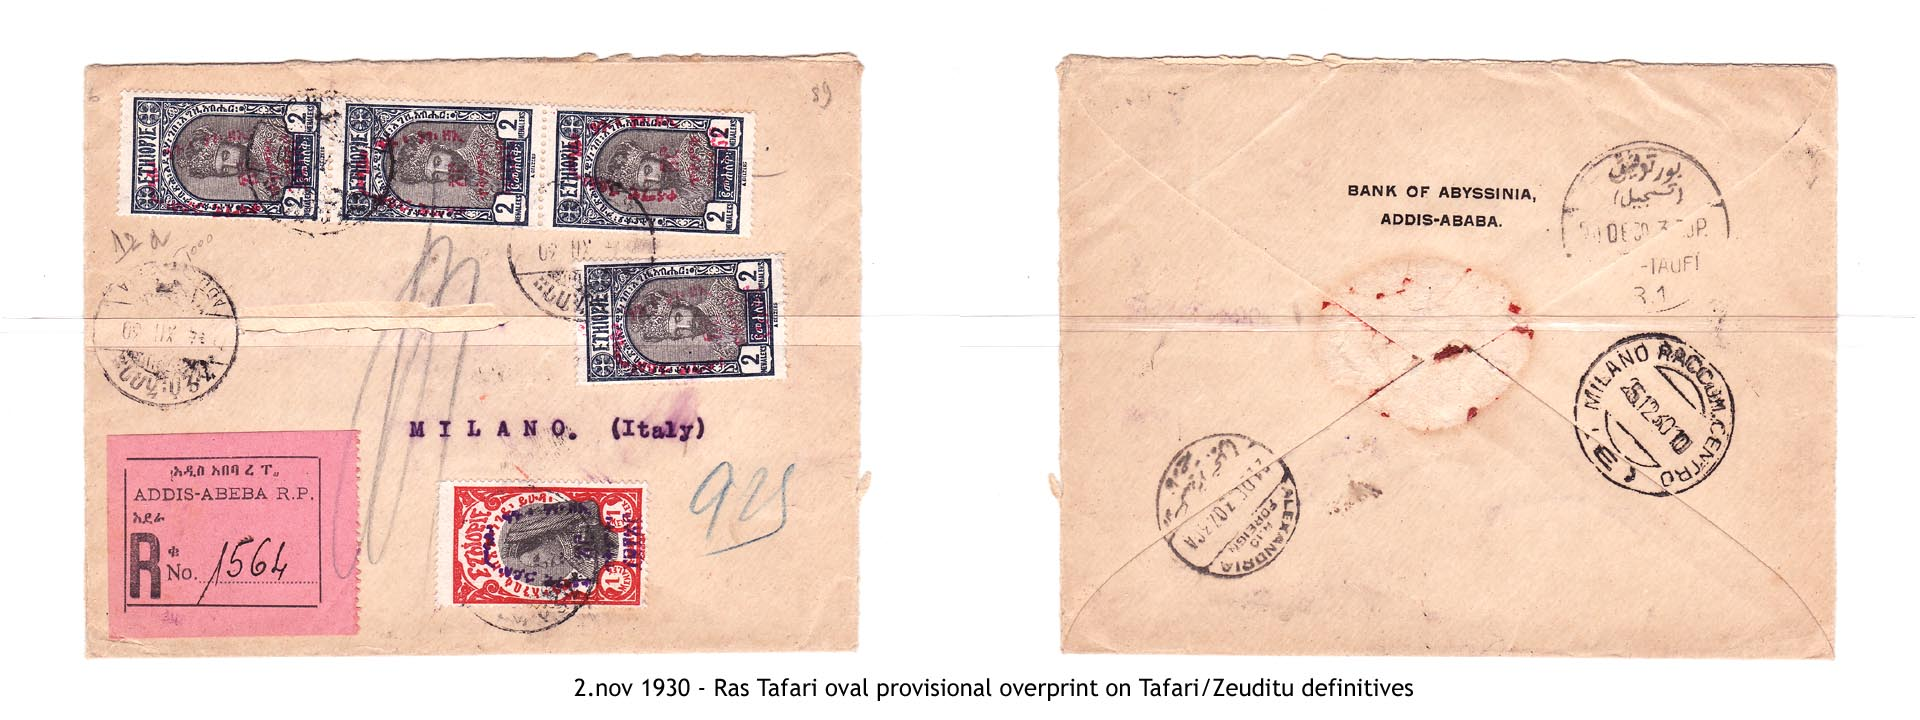 19301102 - Ras Tafari oval provisional overprint on Tafari-Zeuditu definitives